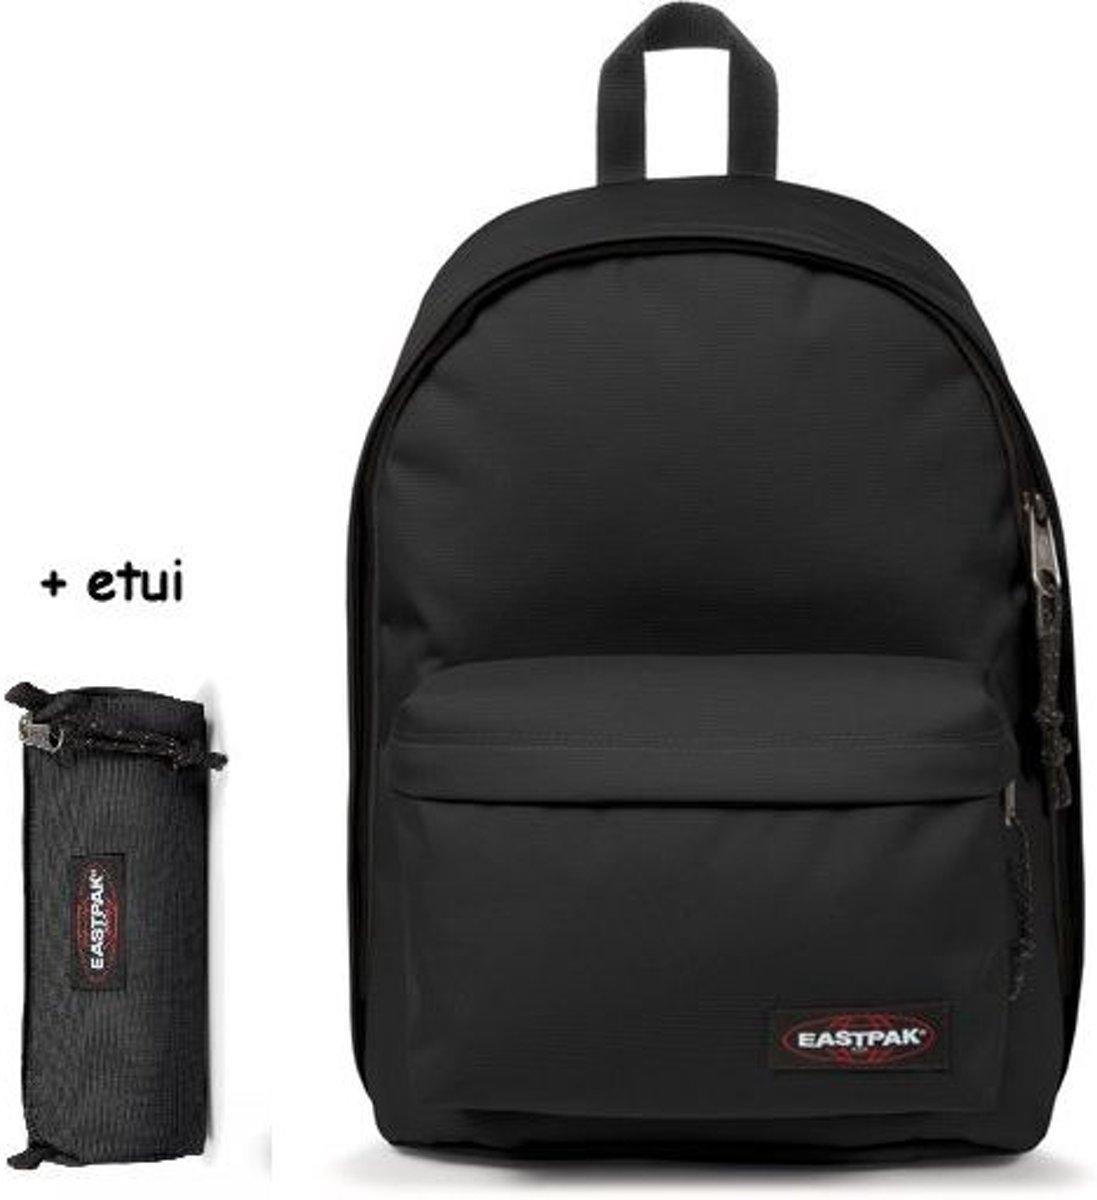 c2b0388095b bol.com | Eastpak - Out Of Office - Rugzak + Etui - Black